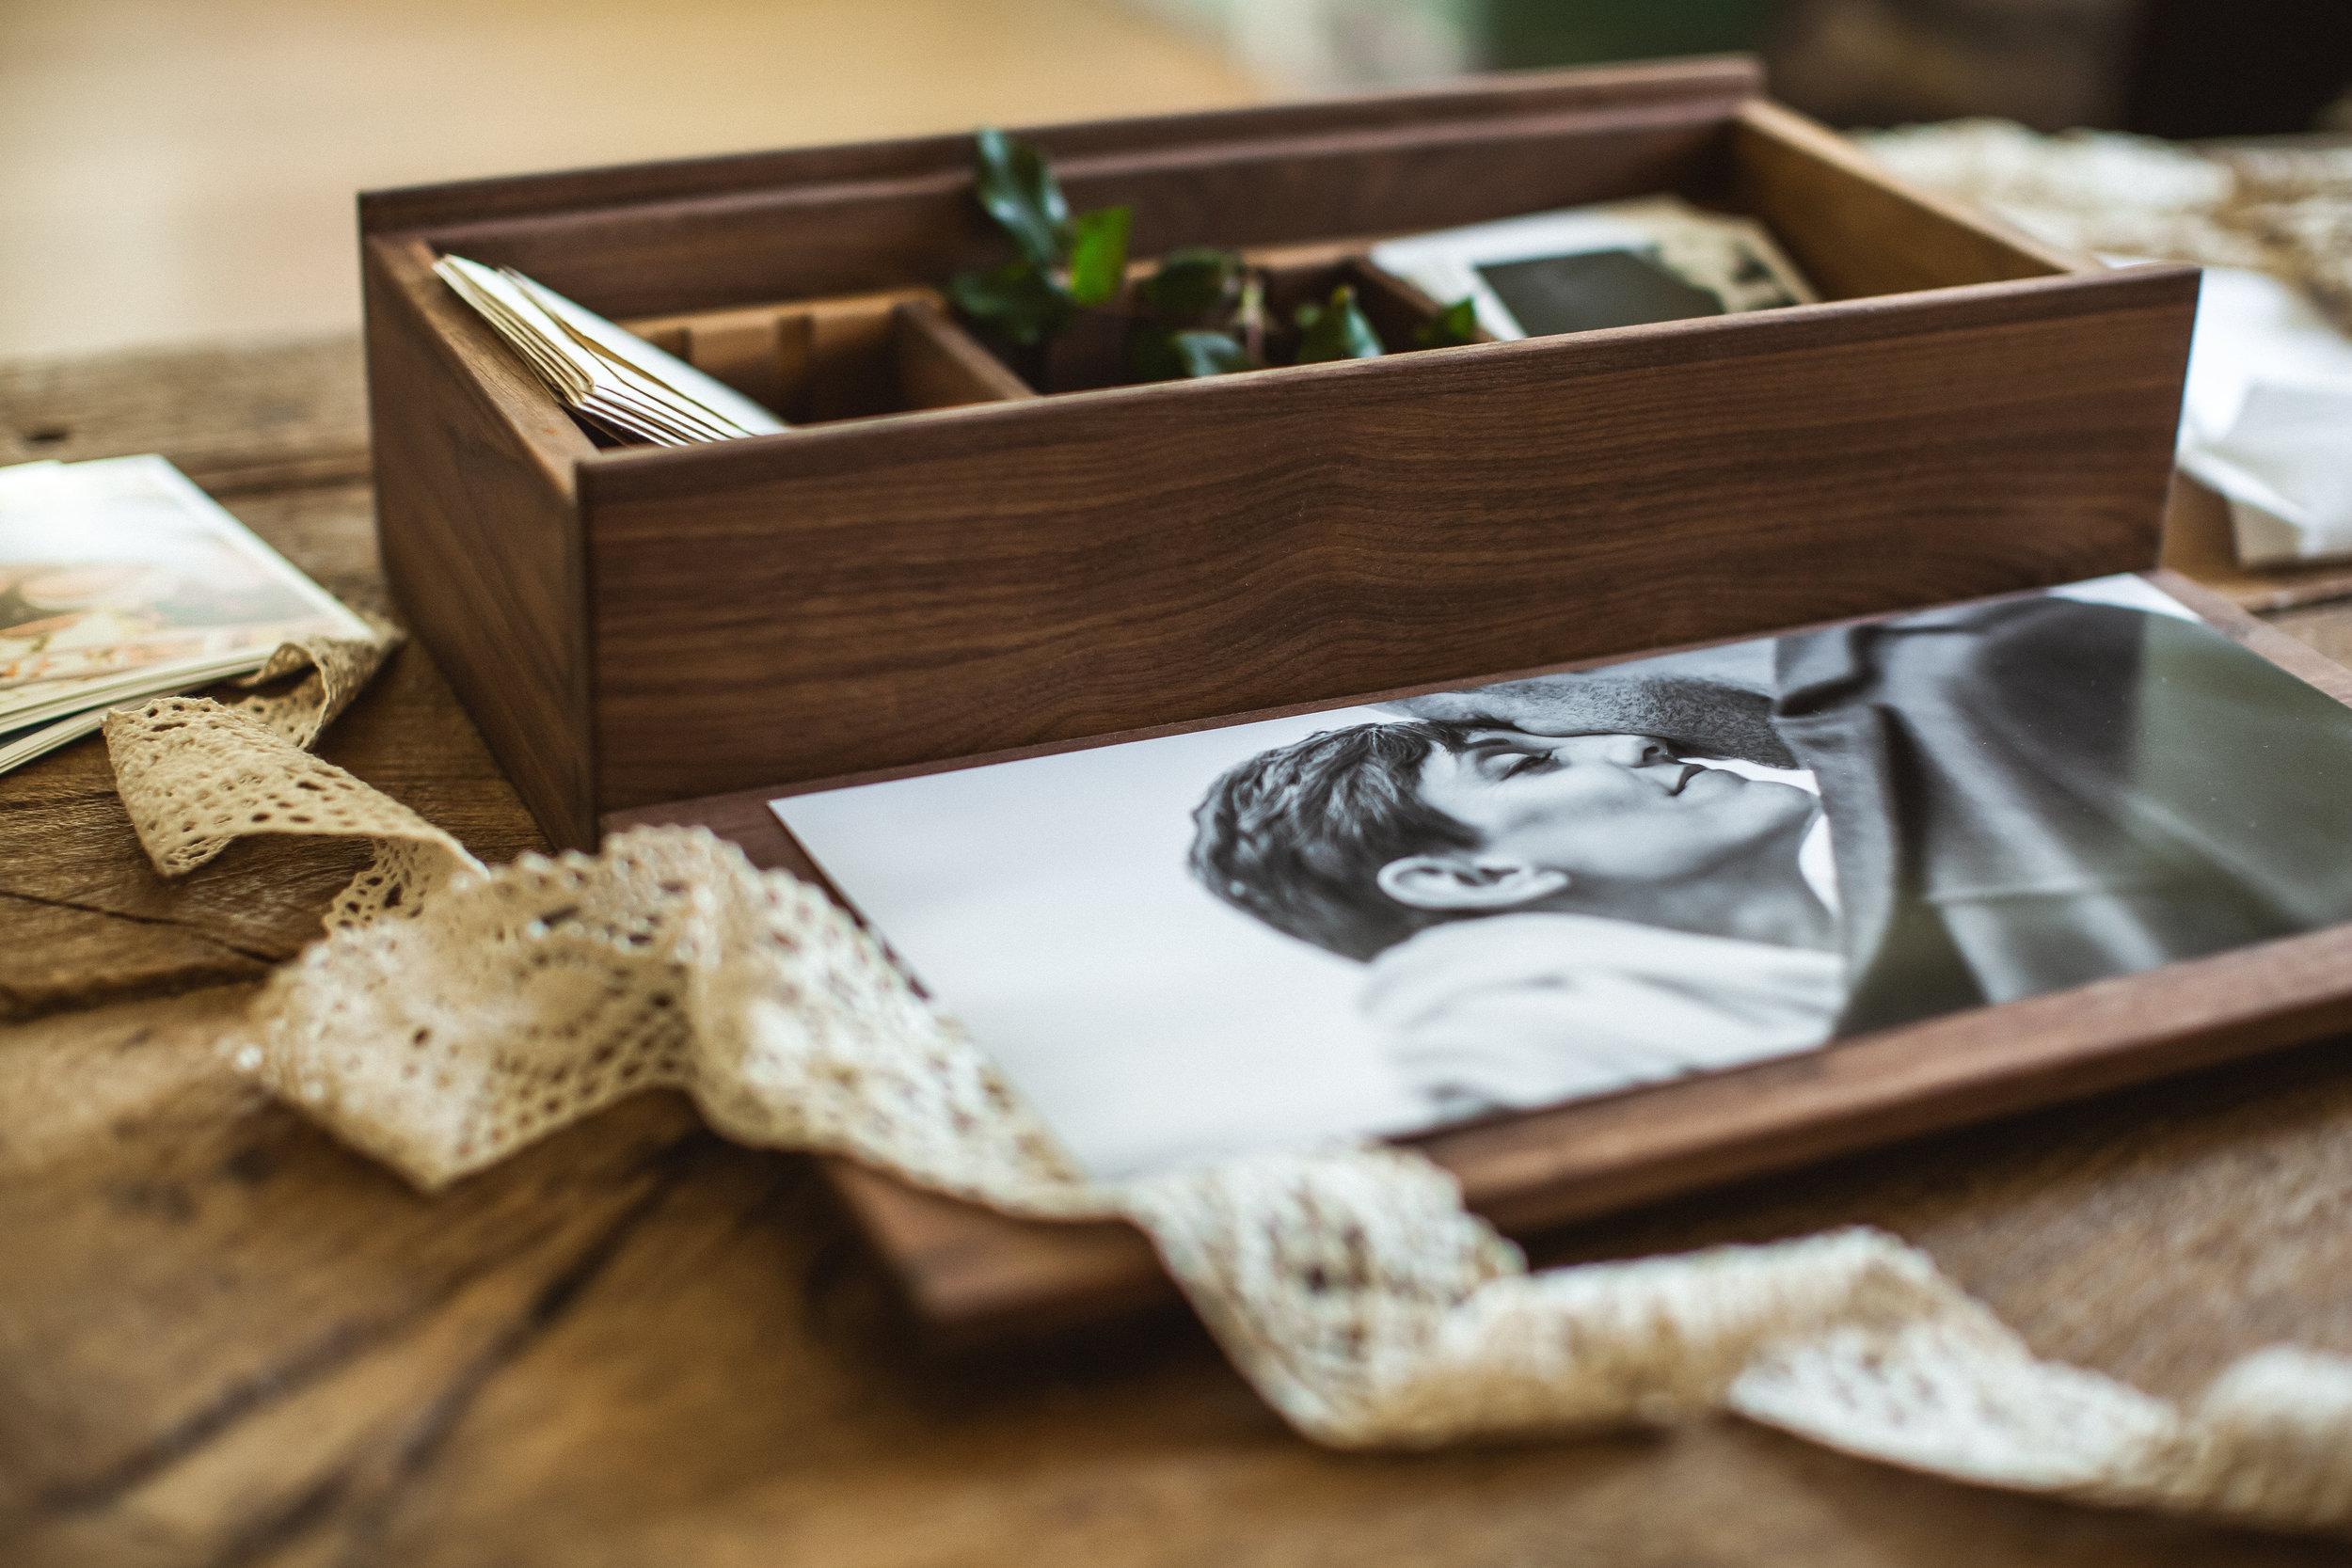 The Heirloom Box — Seasons in Dark Walnut (Image by H.H.Boogie)